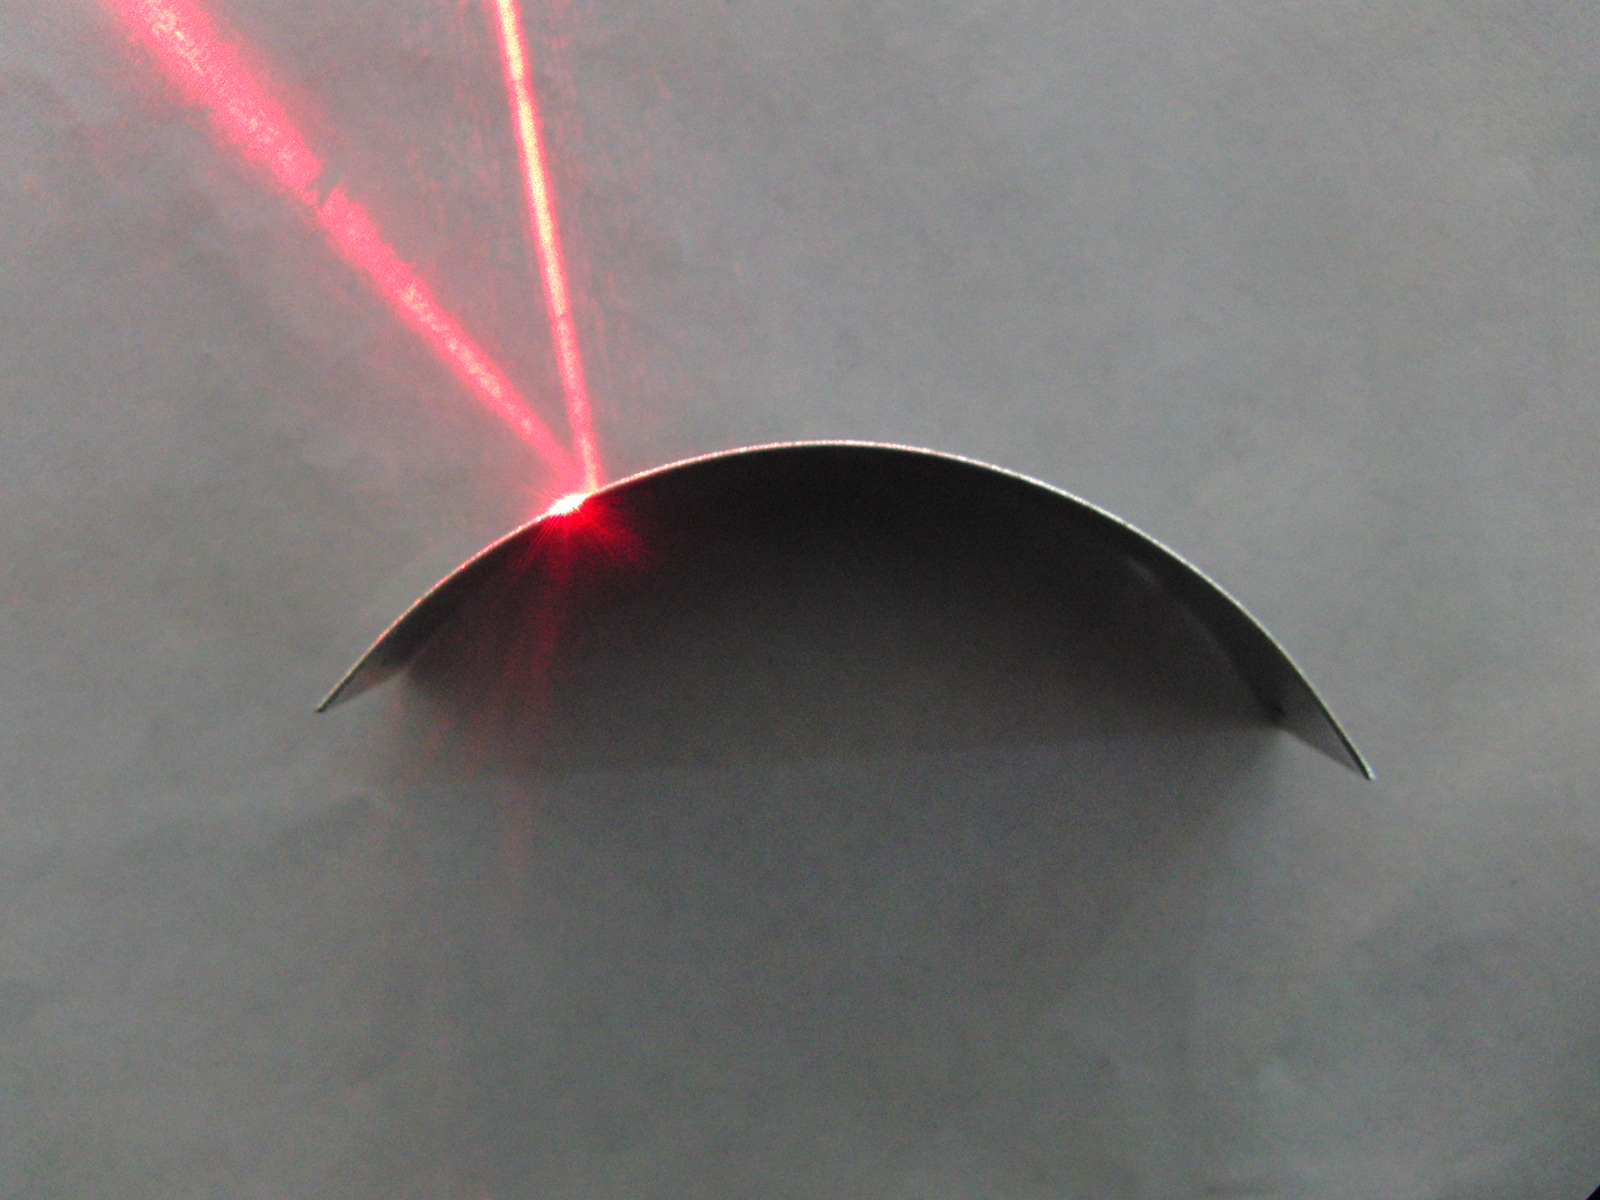 9p 2 3 3 Light Amp Optics